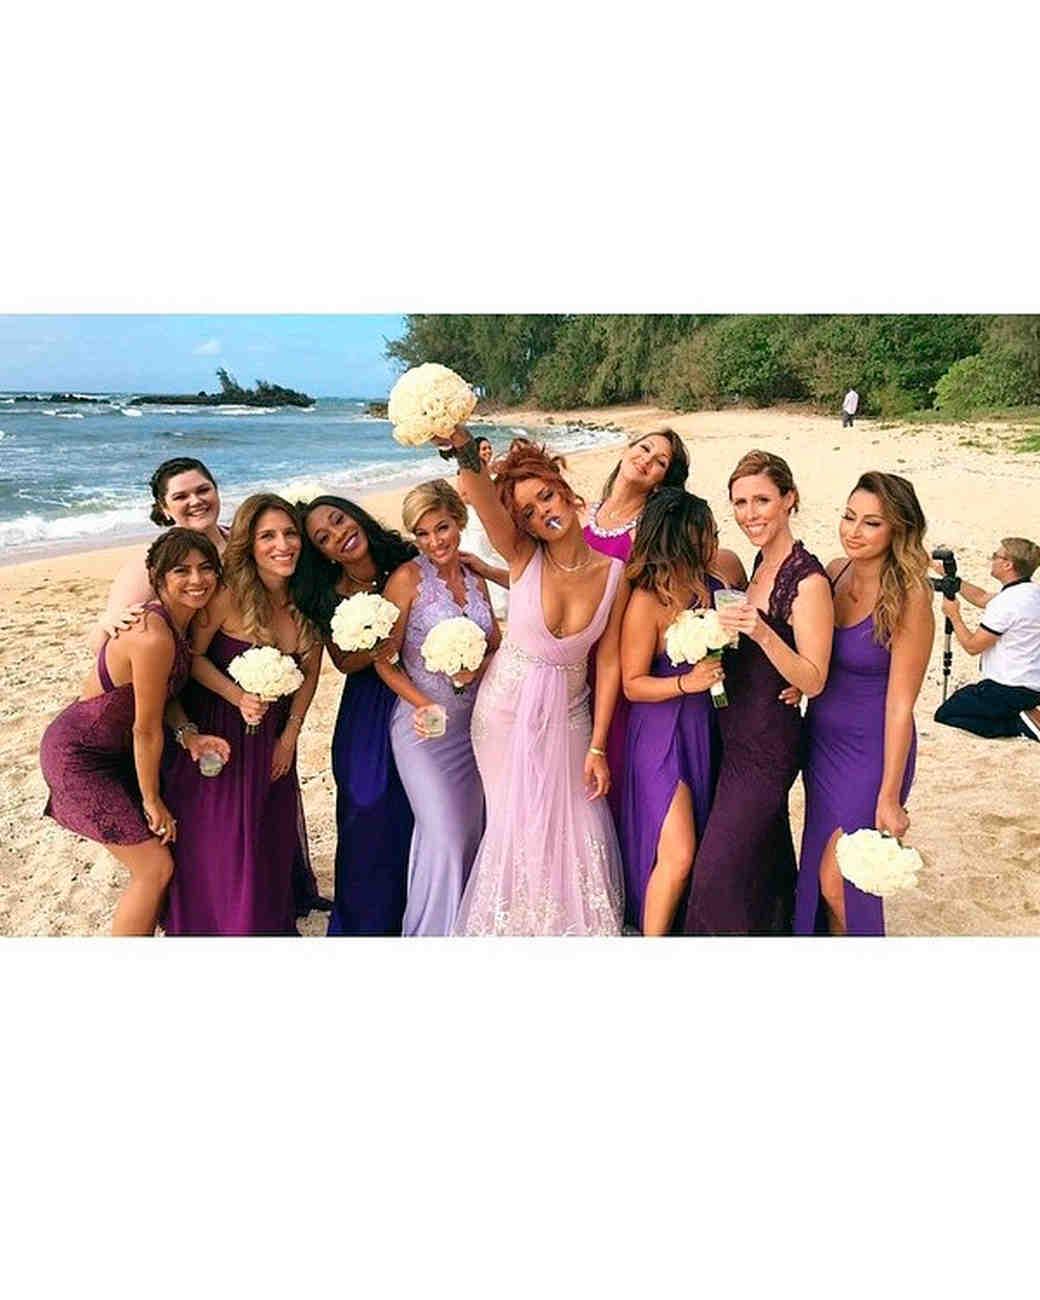 celebrity-wedding-moments-rihanna-bridesmaid-1215.jpg